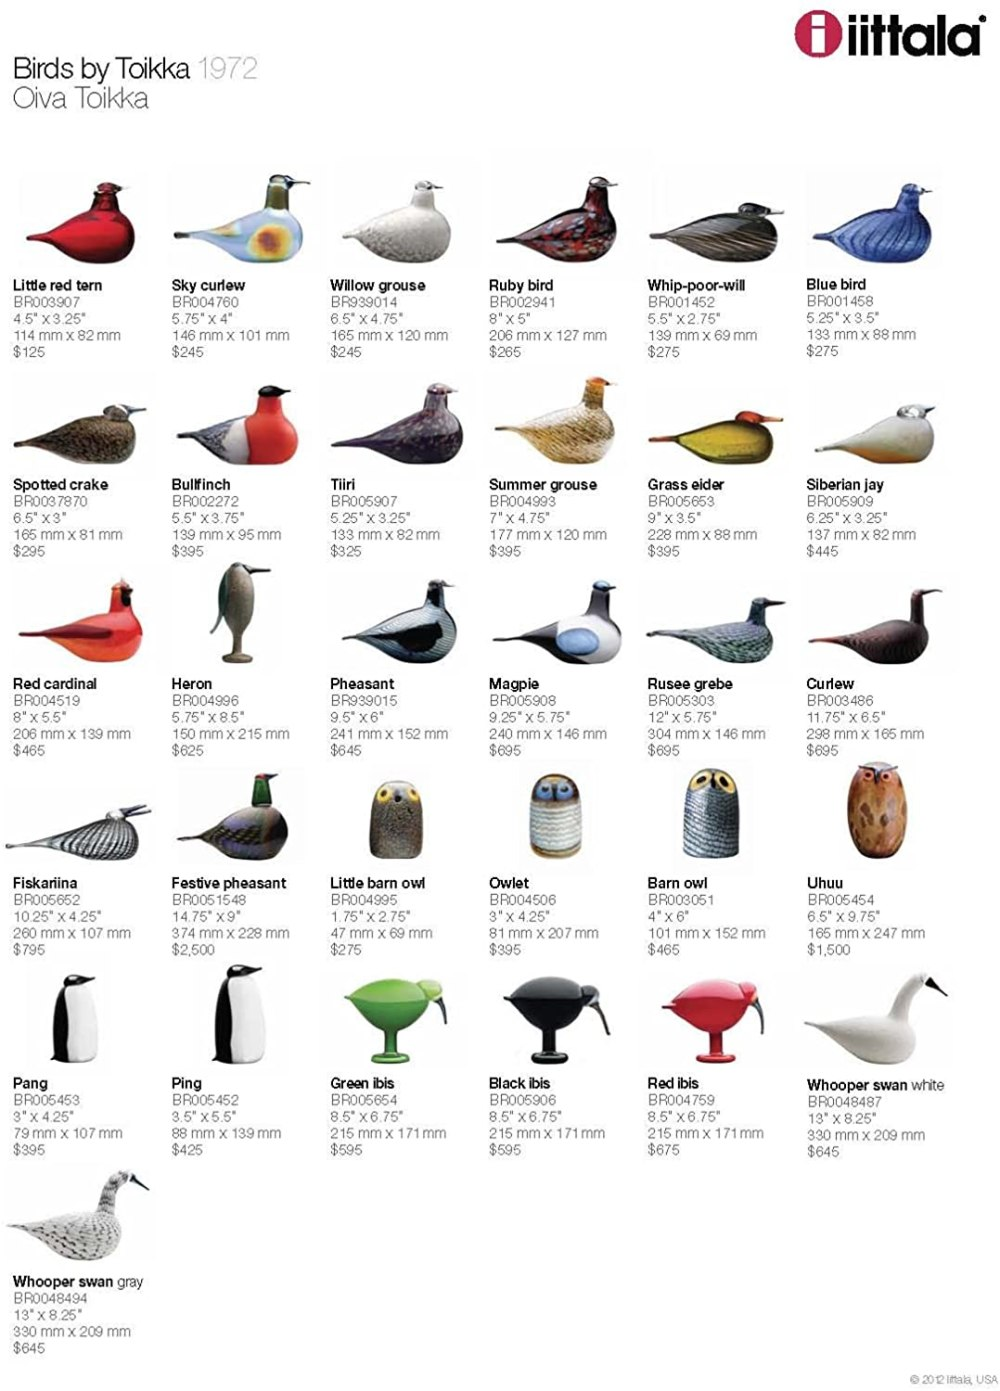 Iittala Birds of Toikka Mouthblown Glass Bird, Blue Bird Product Fact Sheet